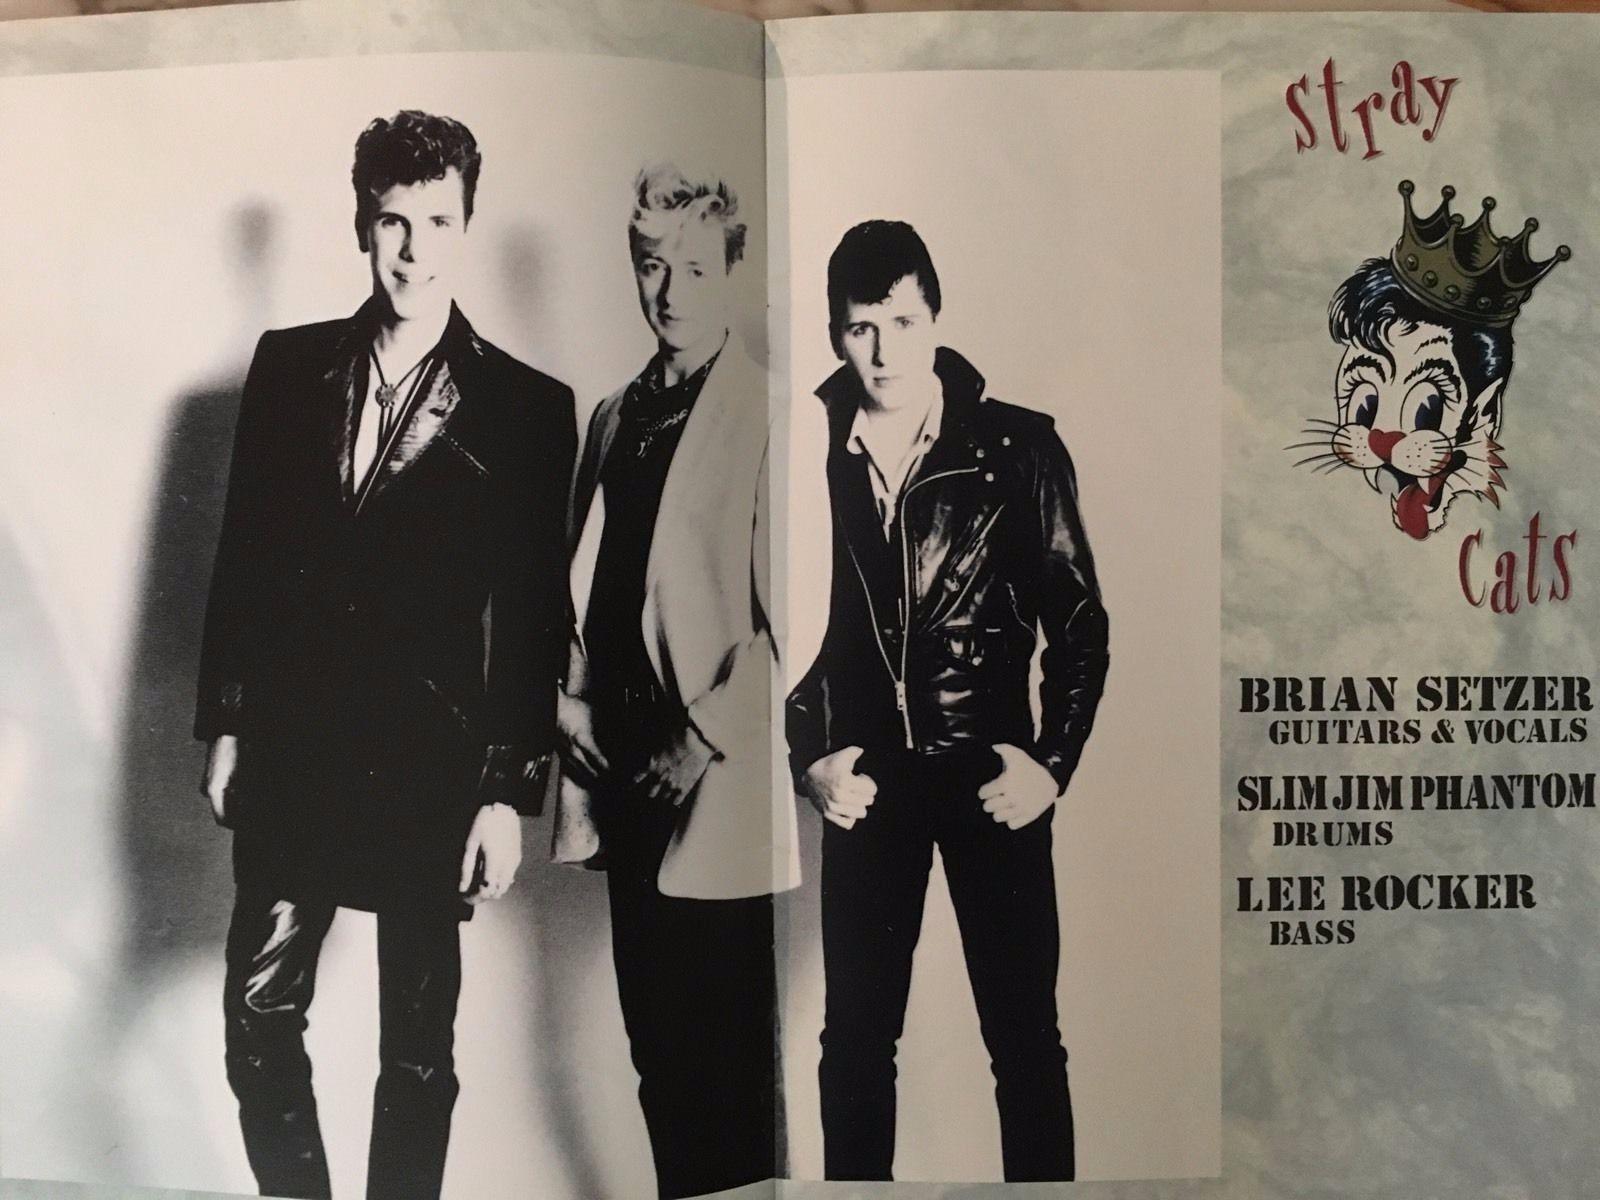 ♫'''Stray Cats 1992 Concert Tour Program, Setzer, Japanese, Rockabilly, Retro...☺...'''♫ http://www.ebay.com/itm/Stray-Cats-1992-Concert-Tour-Program-Setzer-Japanese-Rockabilly-Retro-/252155522274?hash=item3ab5a3ece2:g:jh4AAOSw5VFWOP6j